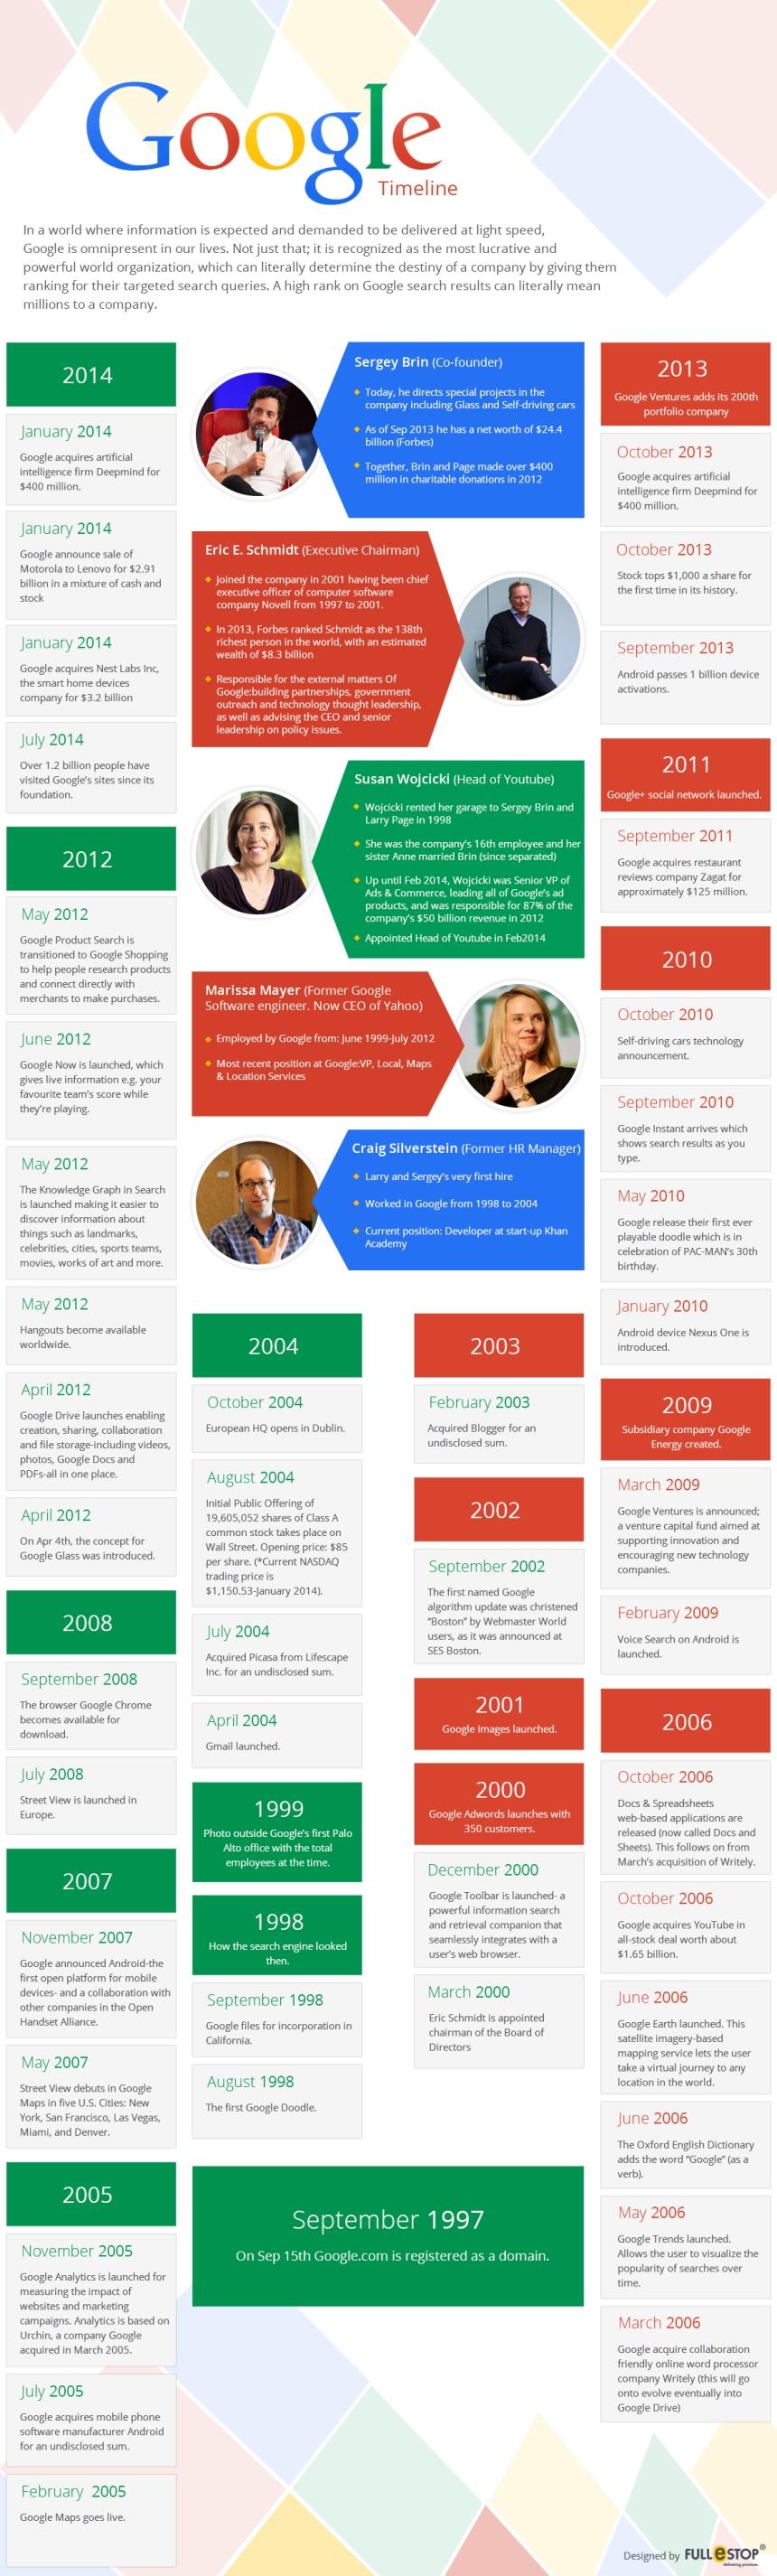 Timeline de Google